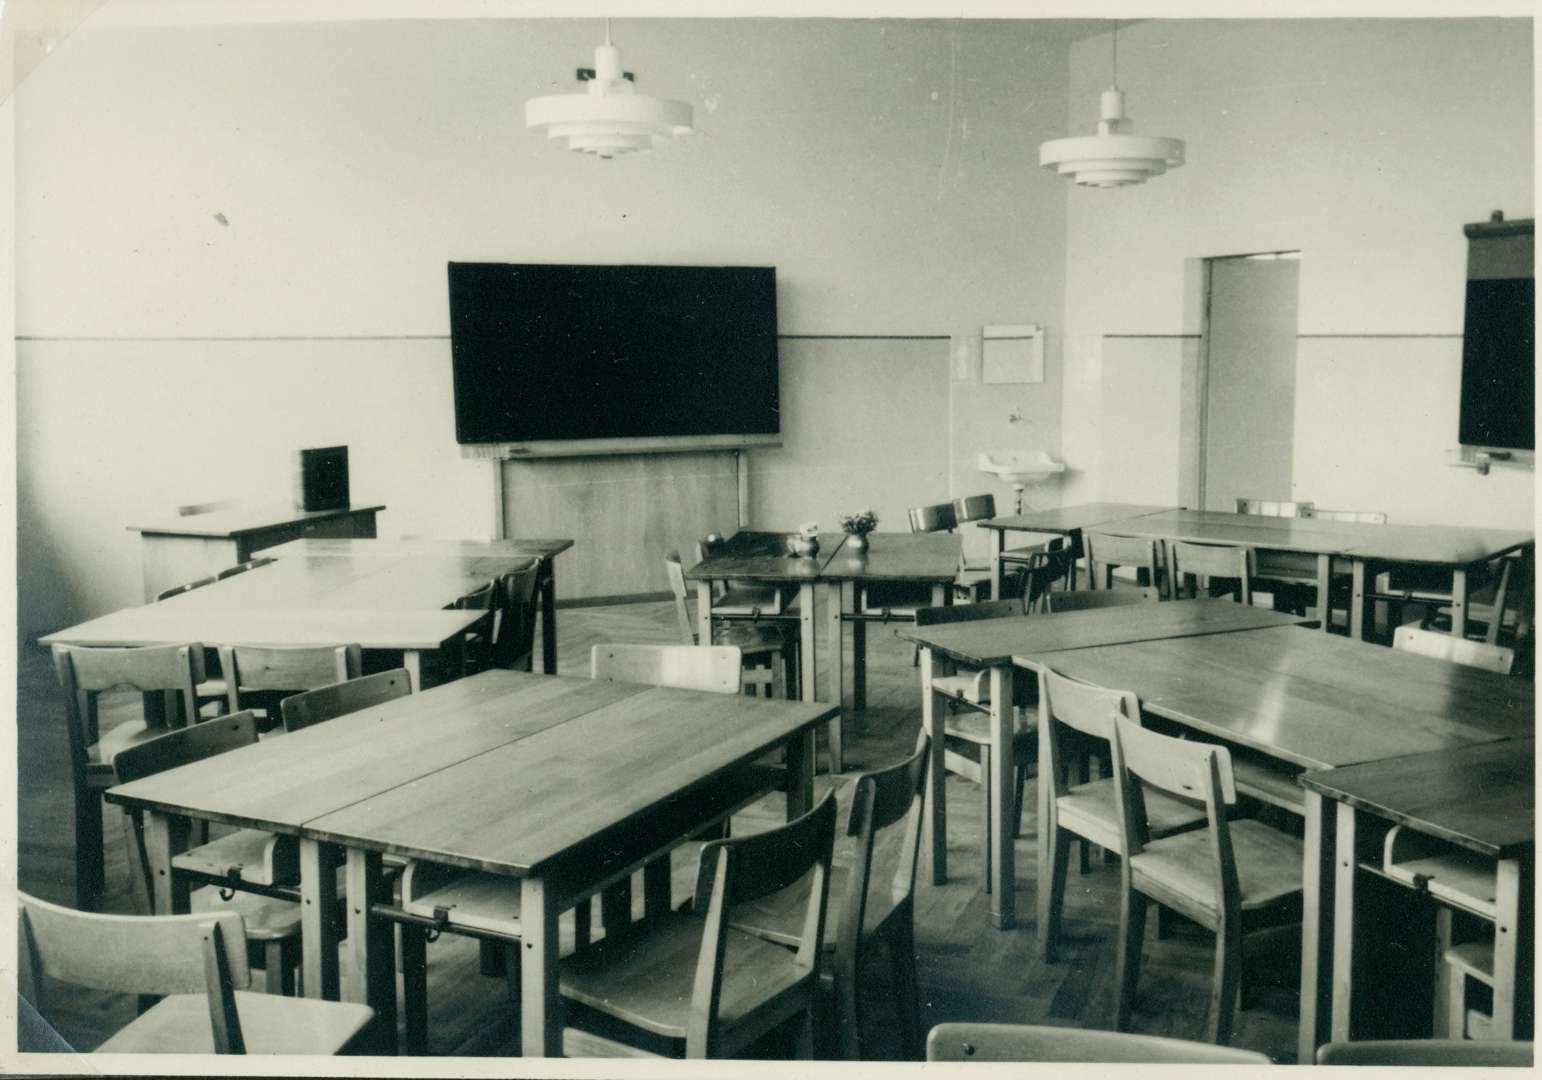 [Schulhausneubau in Brühl:] Saal mit freiem Gestühl, Bild 1